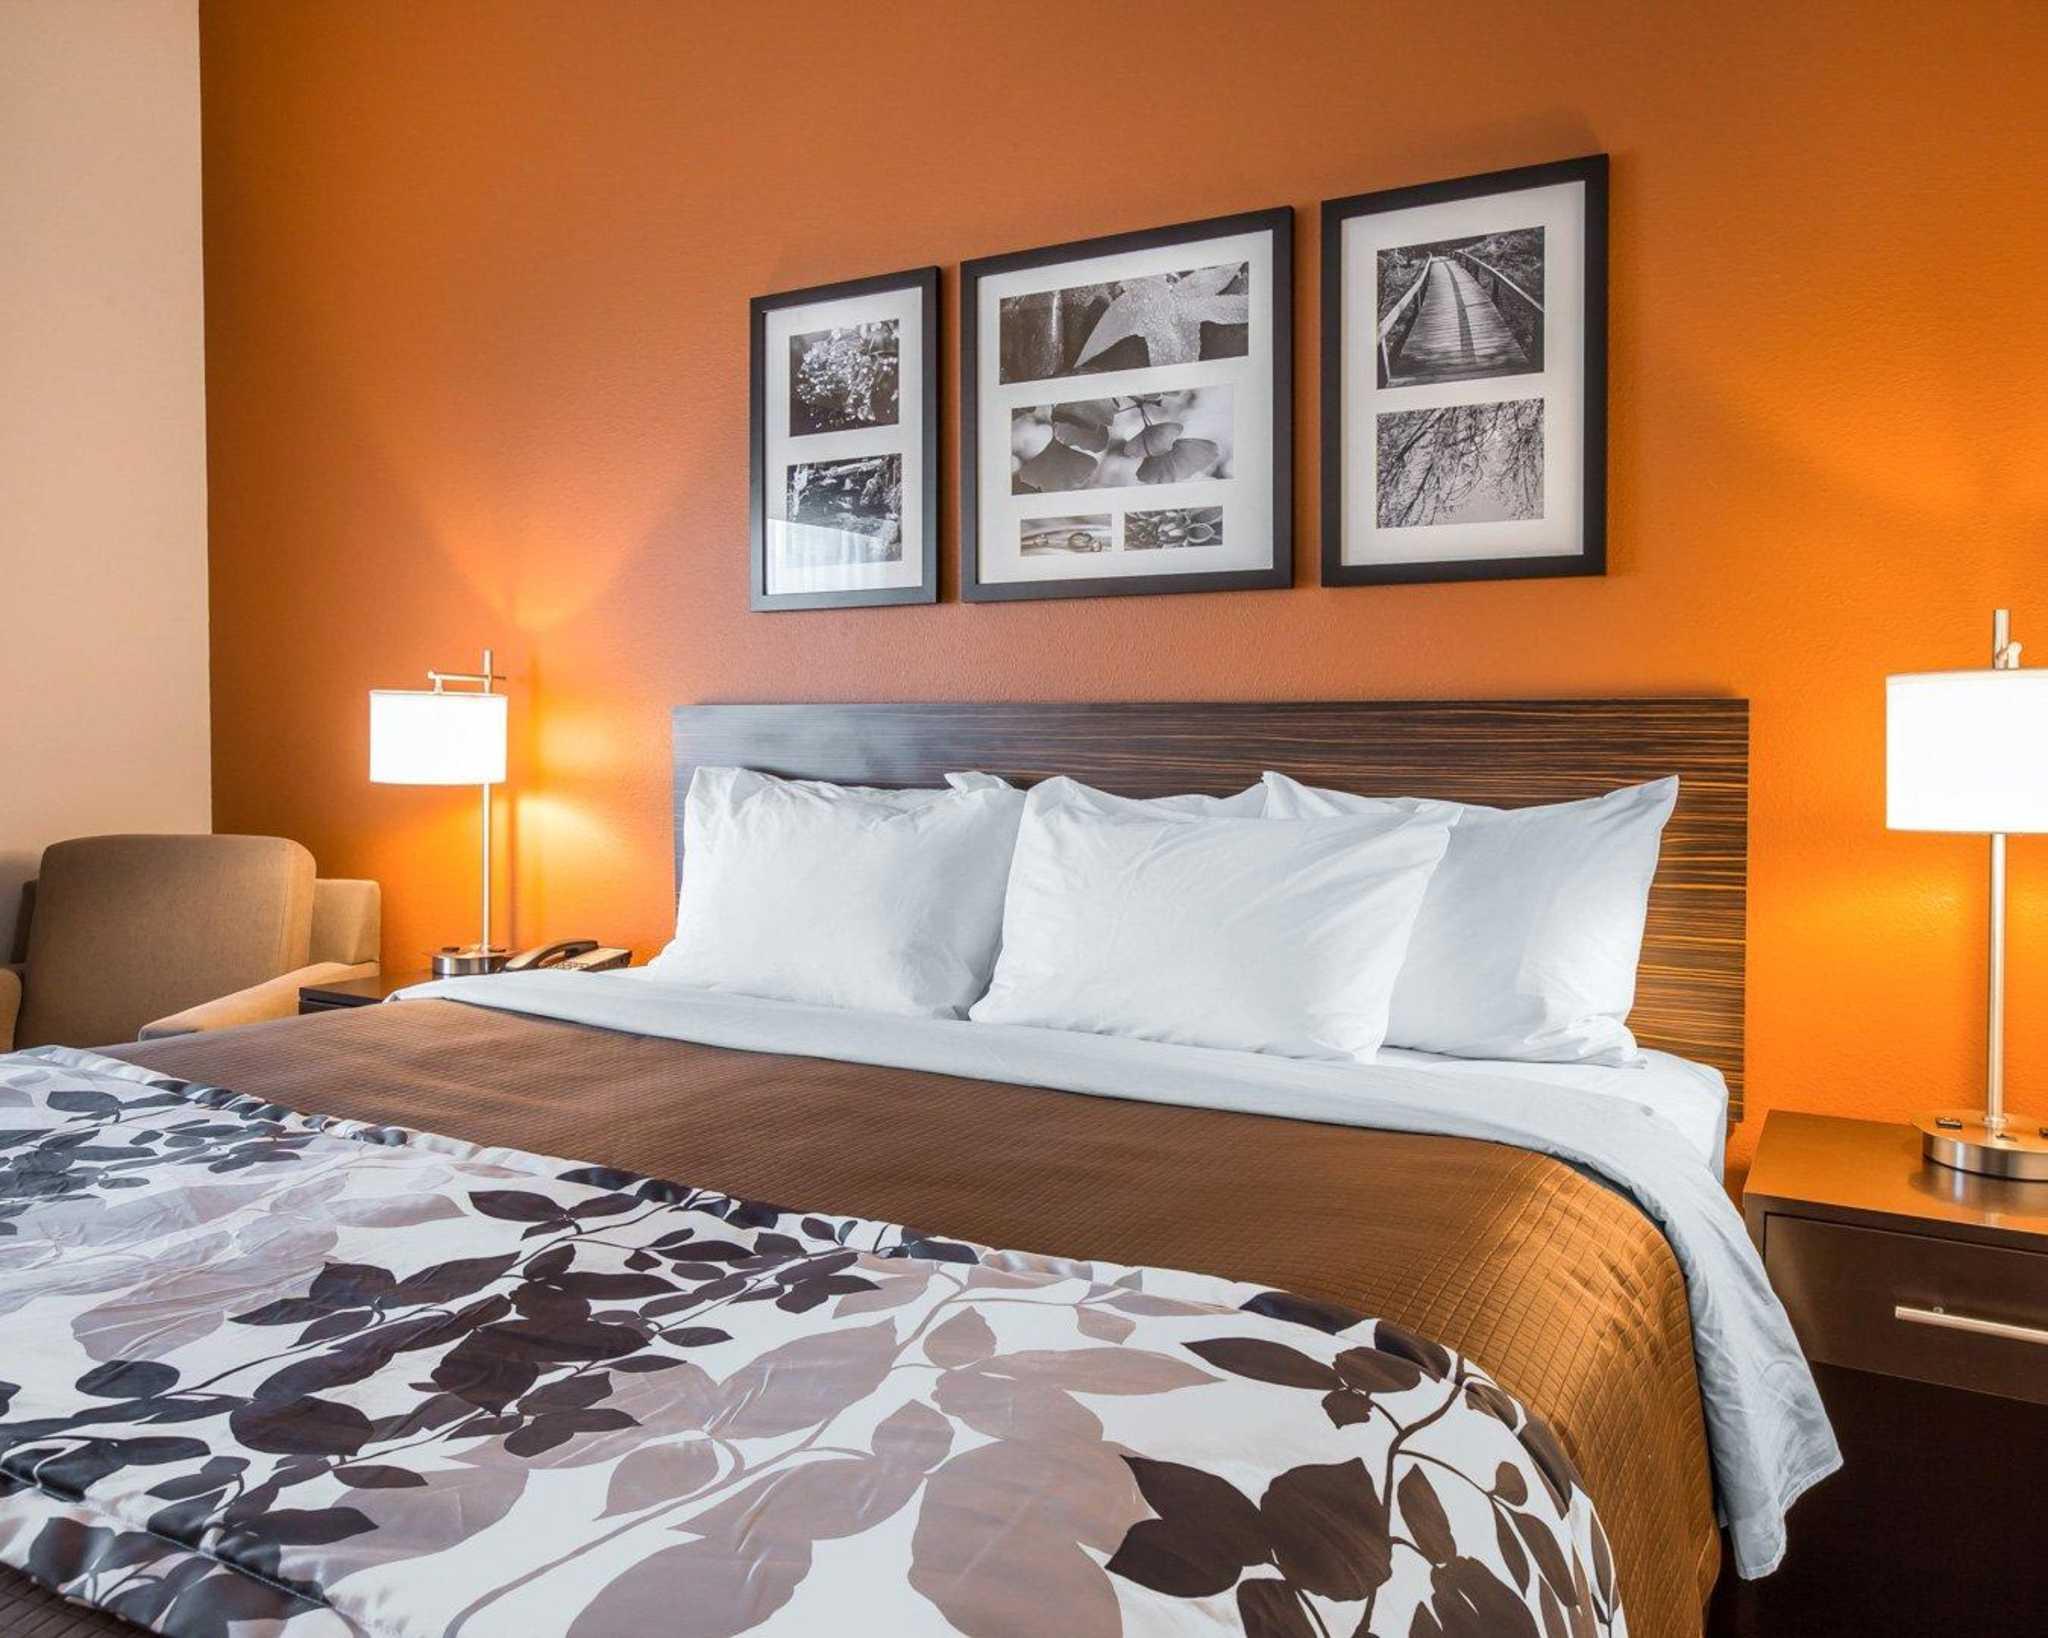 Sleep Inn Cartersville - Emerson Lake Point